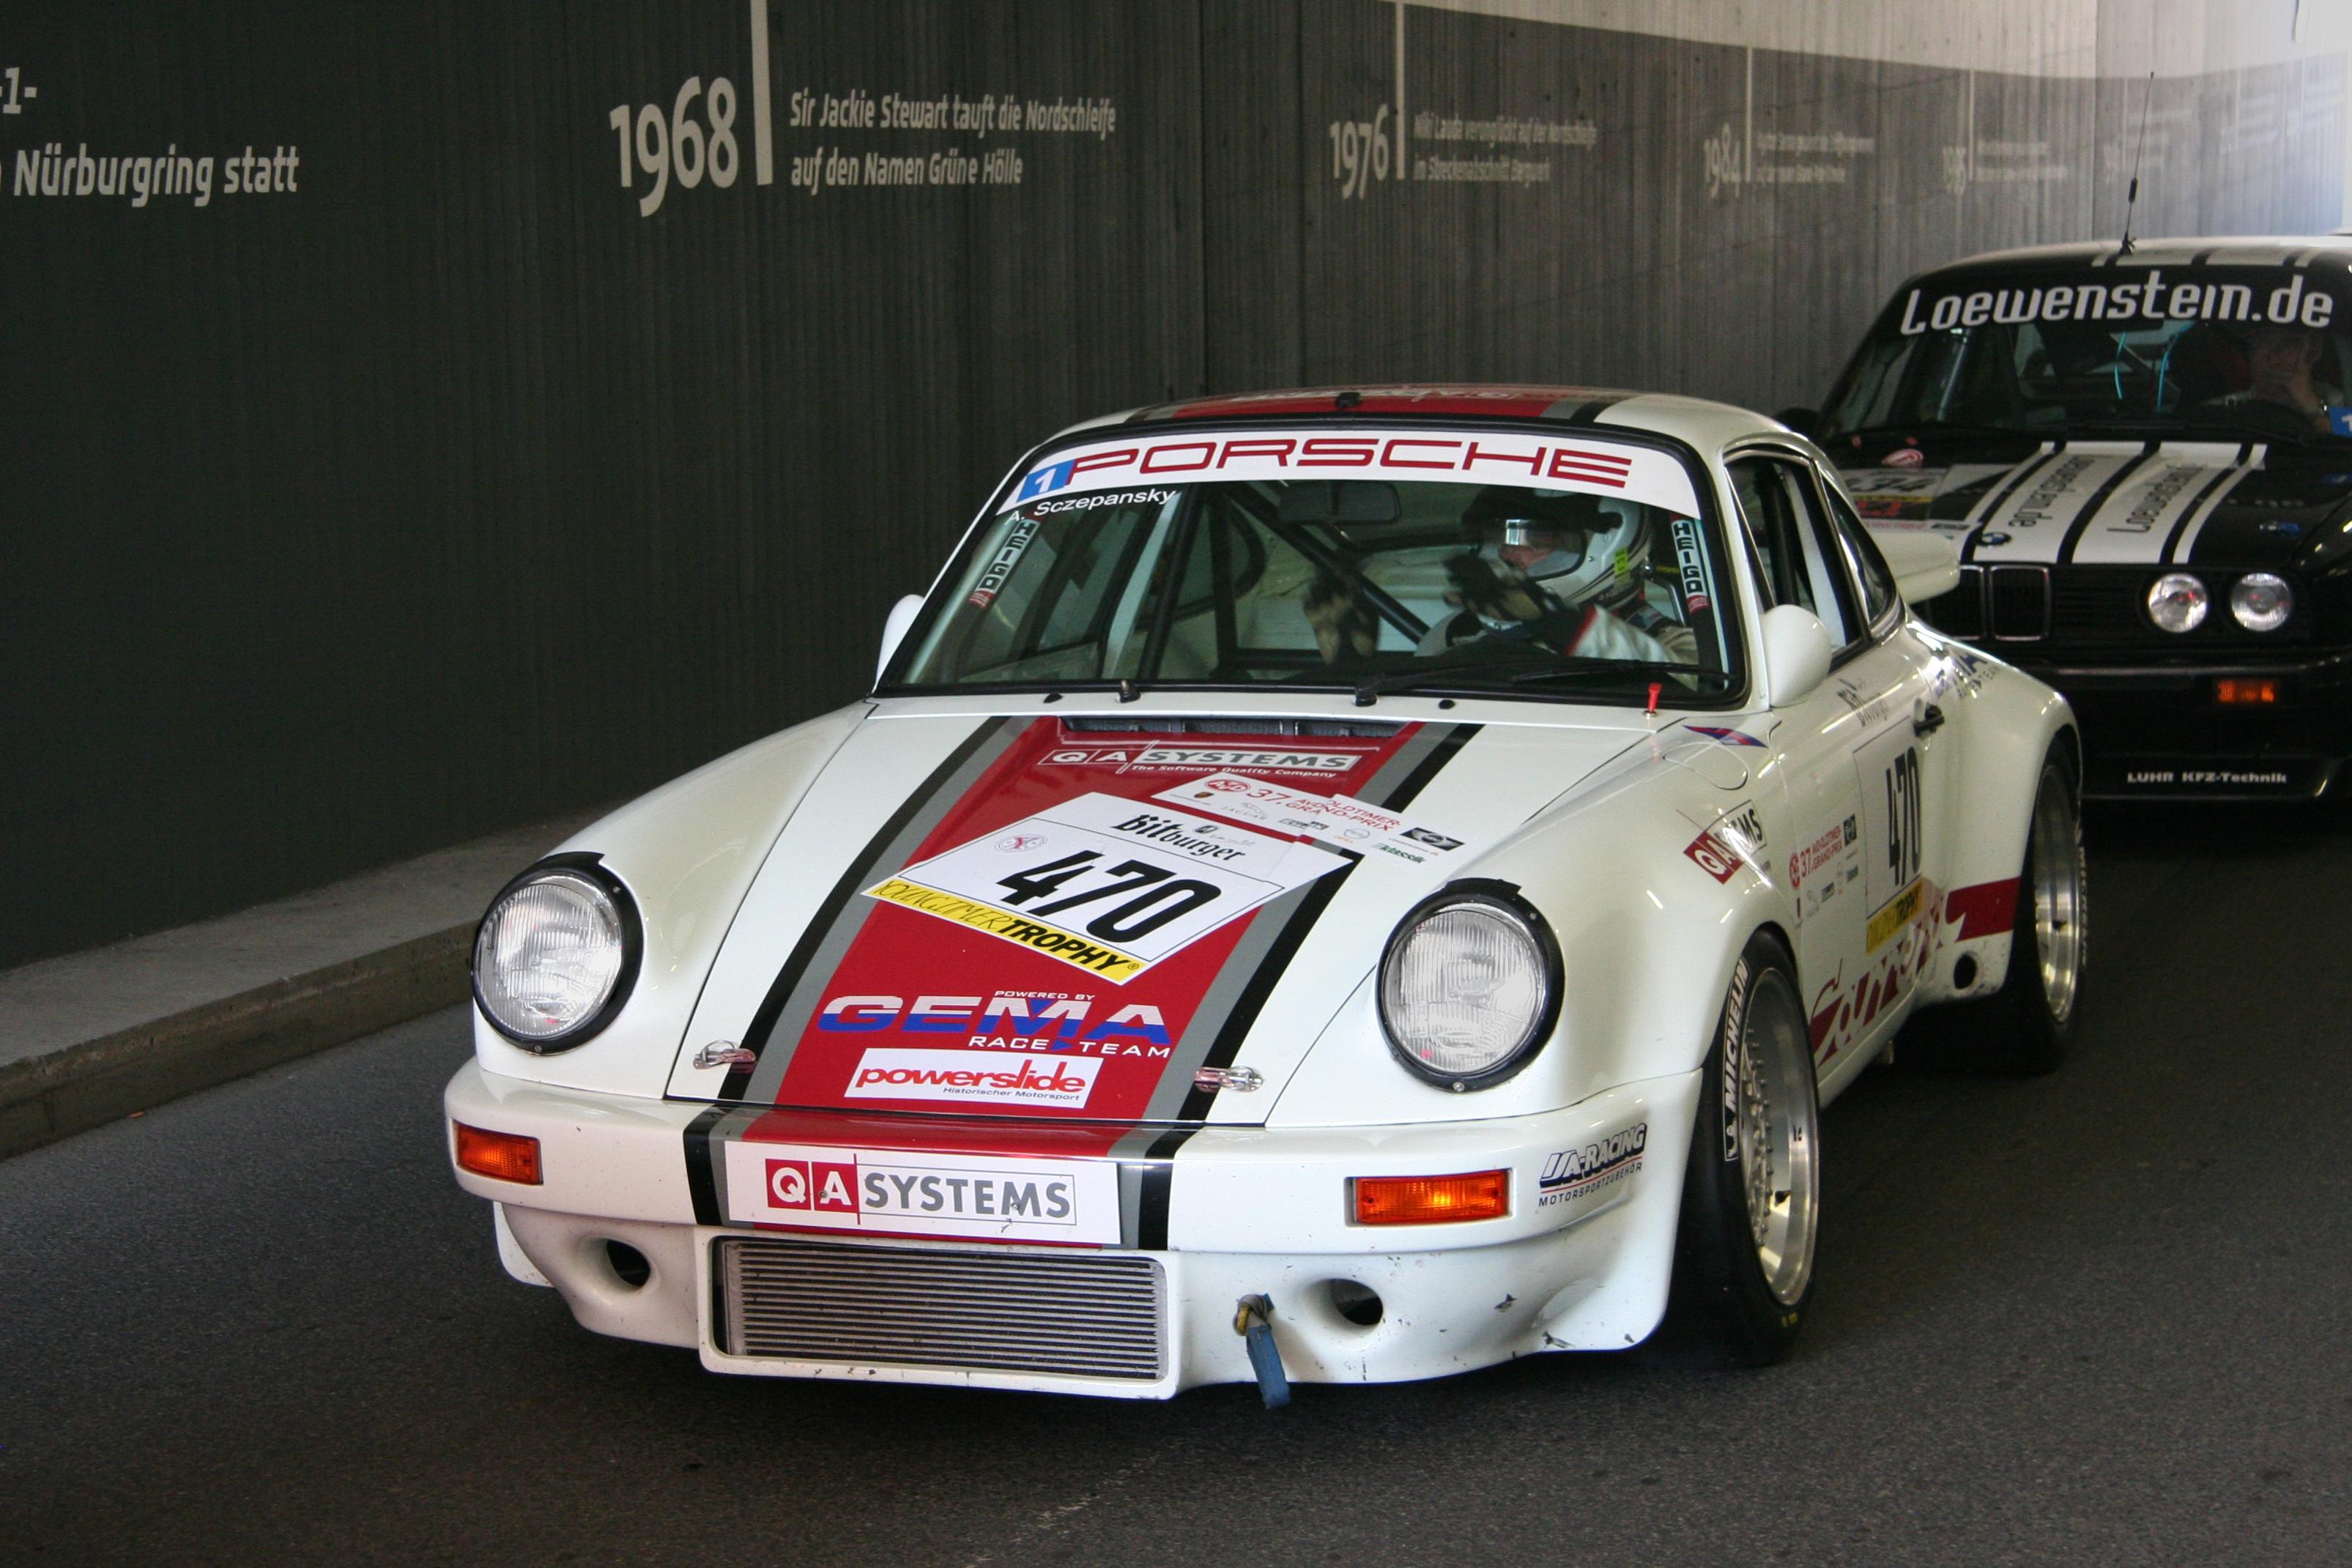 File:2009-08-07 1020 Oldtimer-GP - Porsche 911 SC, Bj ...